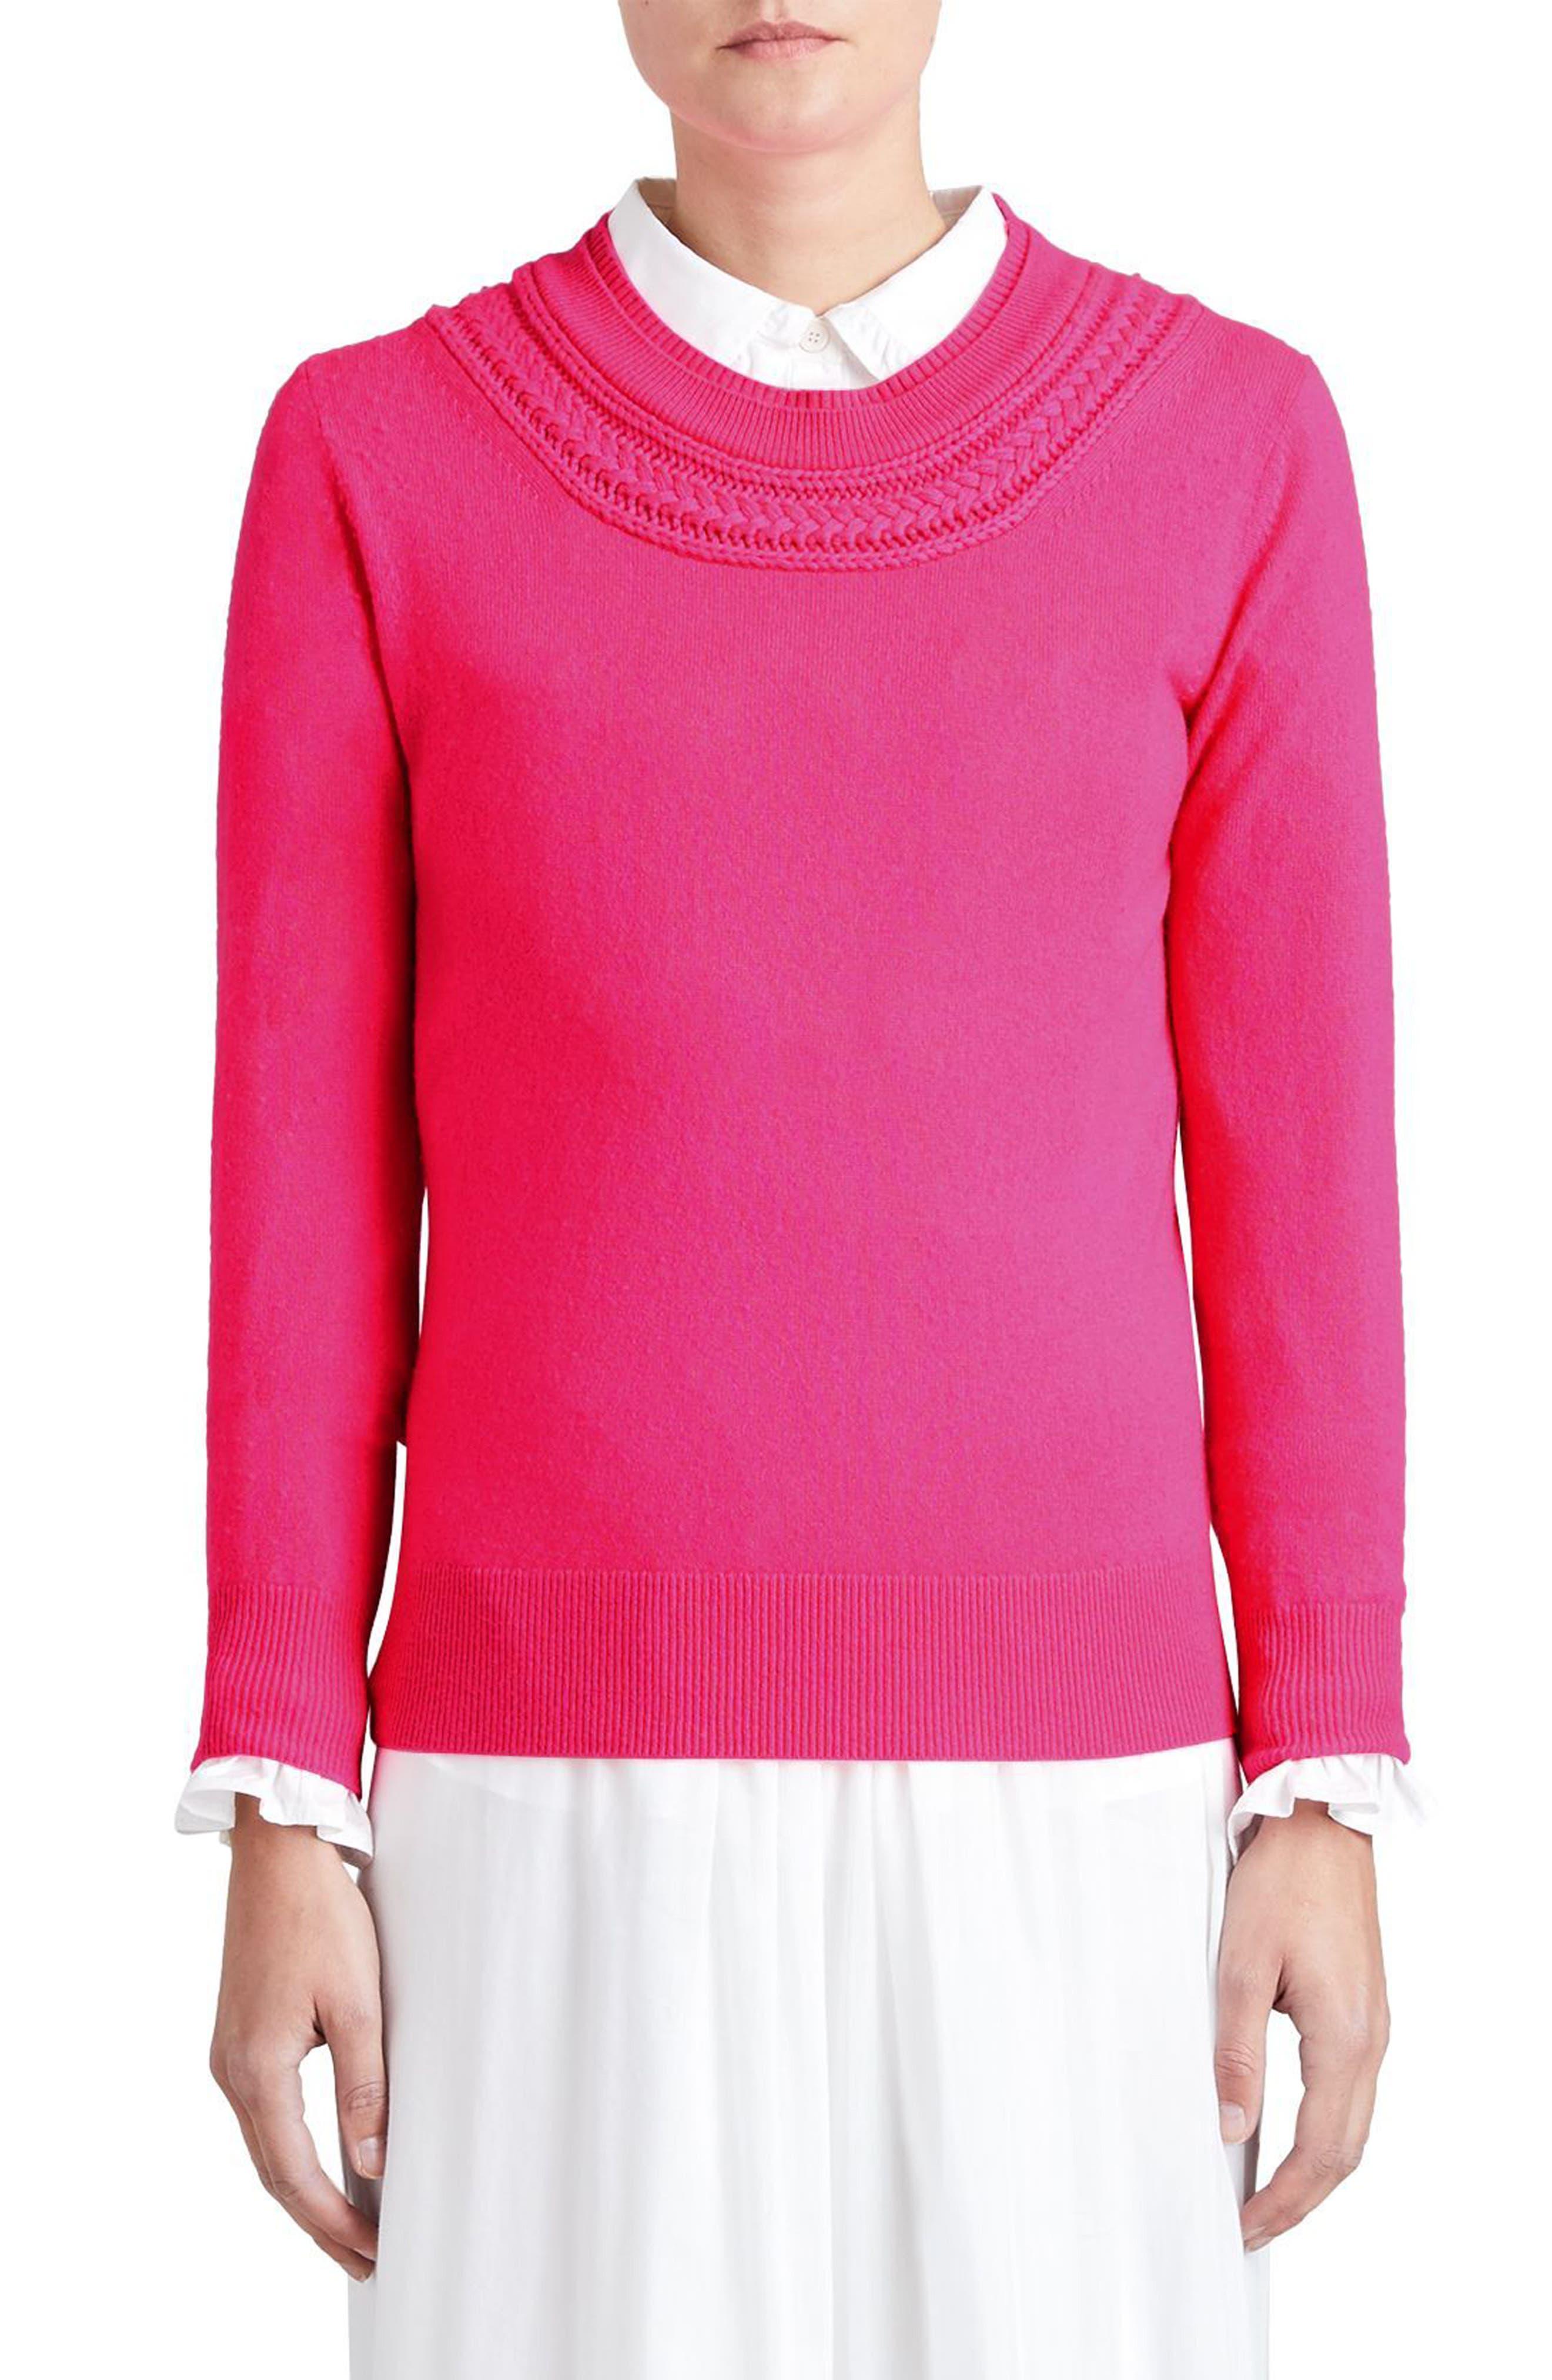 Guadaira Cashmere Sweater,                             Main thumbnail 1, color,                             671